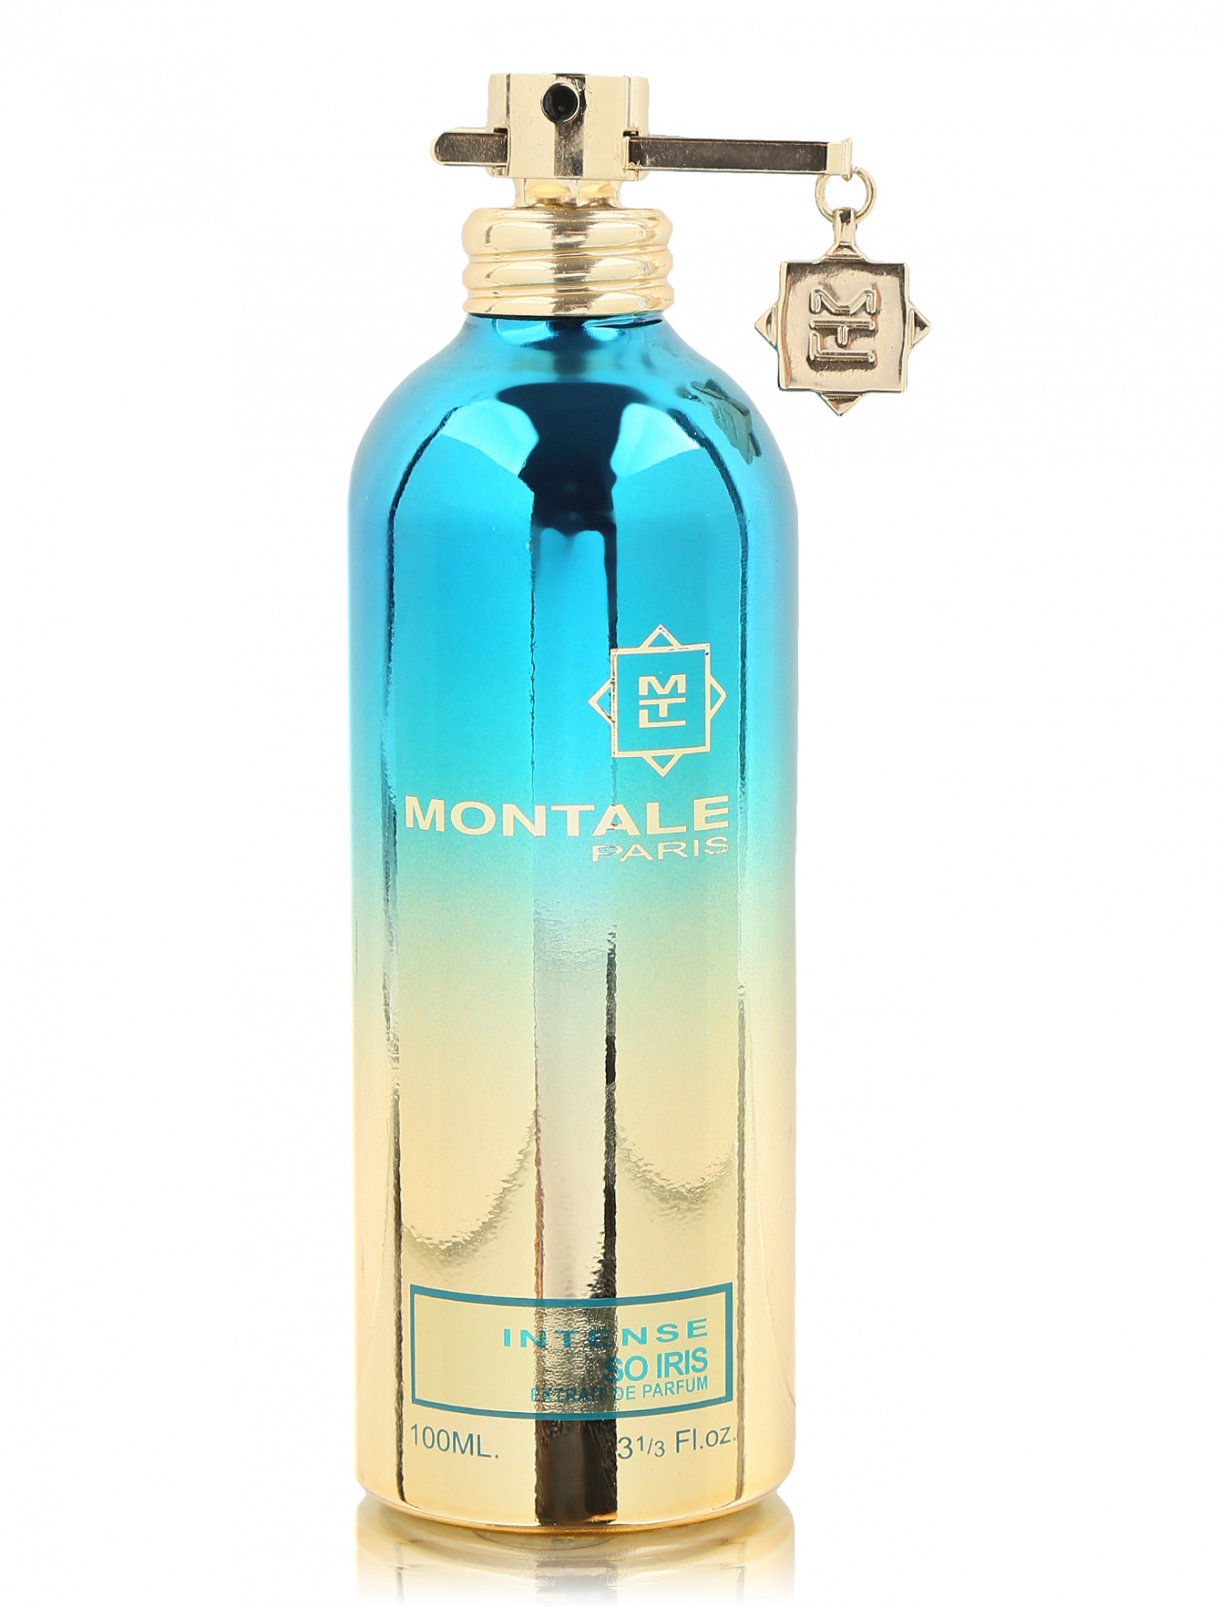 Парфюмерная вода 100 мл Intense So Iris Montale  –  Общий вид